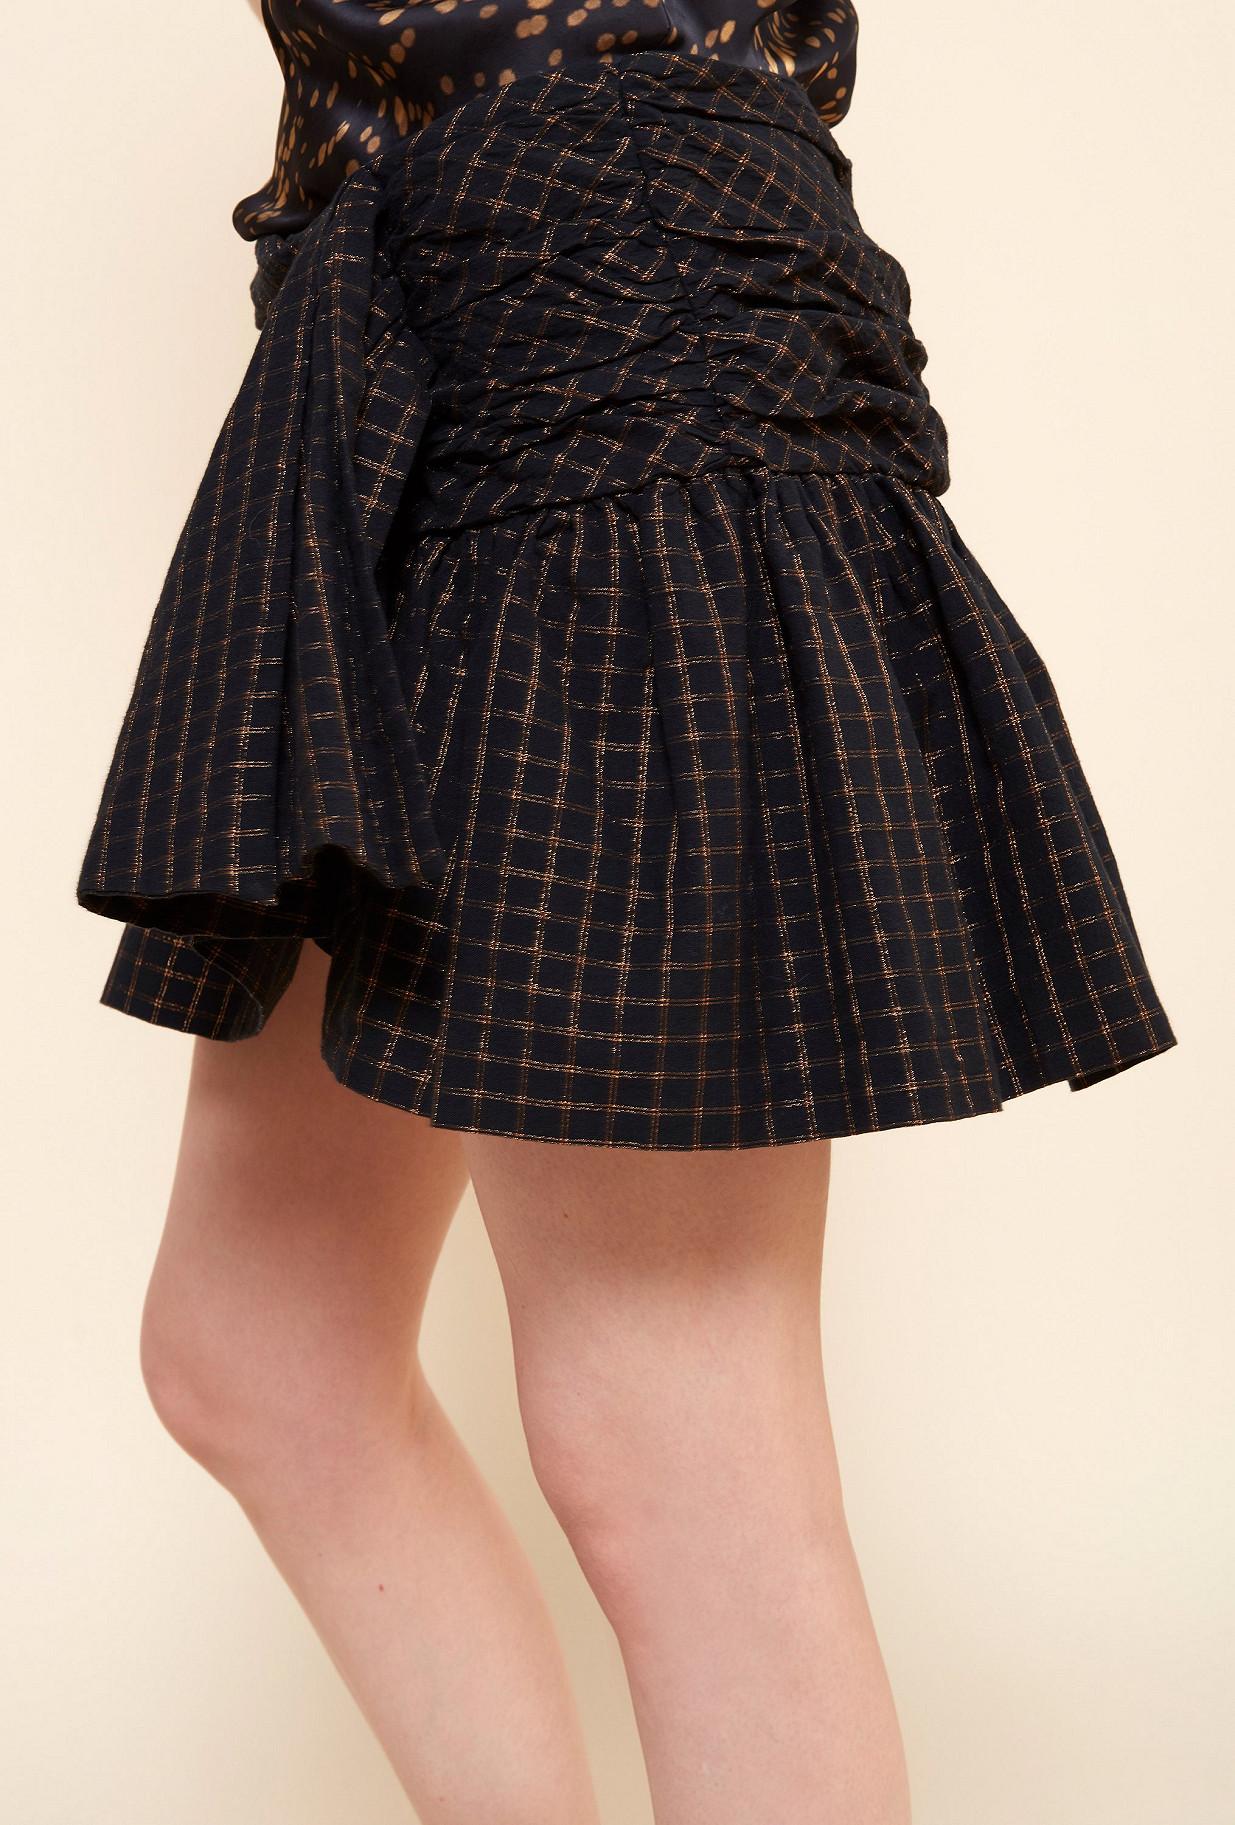 Black  Skirt  Sylvia Mes demoiselles fashion clothes designer Paris